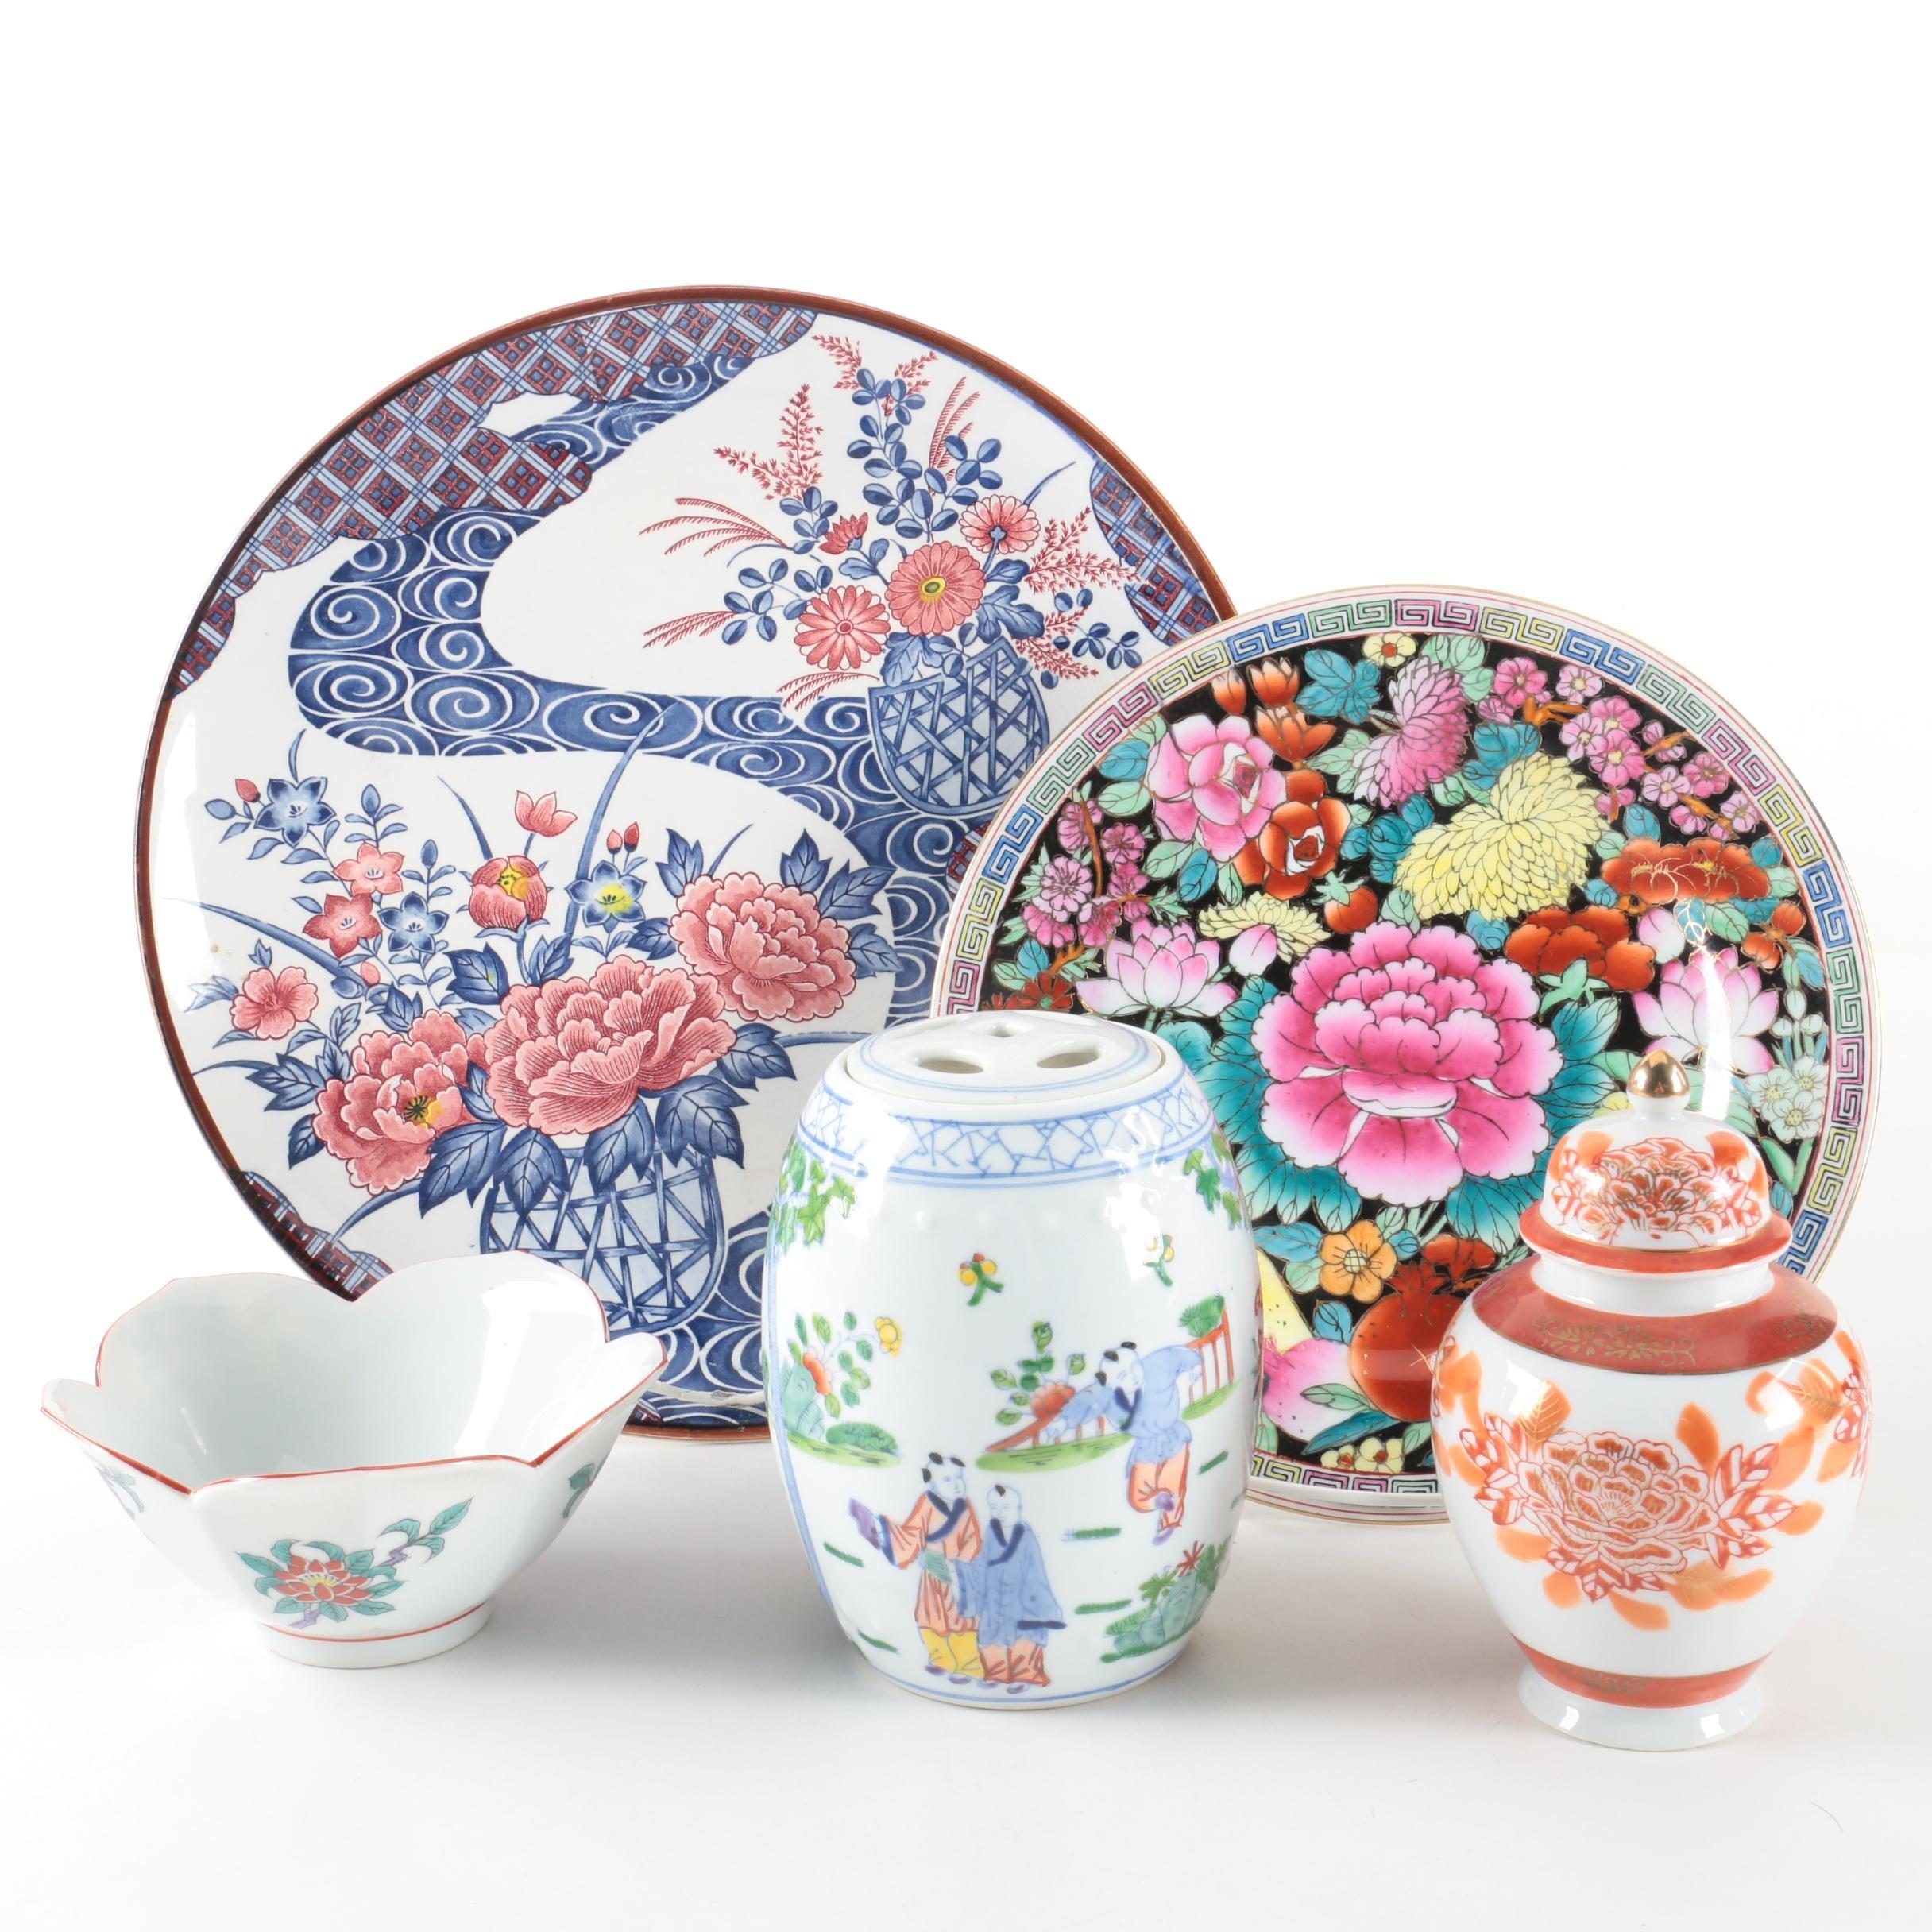 Chinese and Japanese Decorative Porcelain Including Ginger Jar